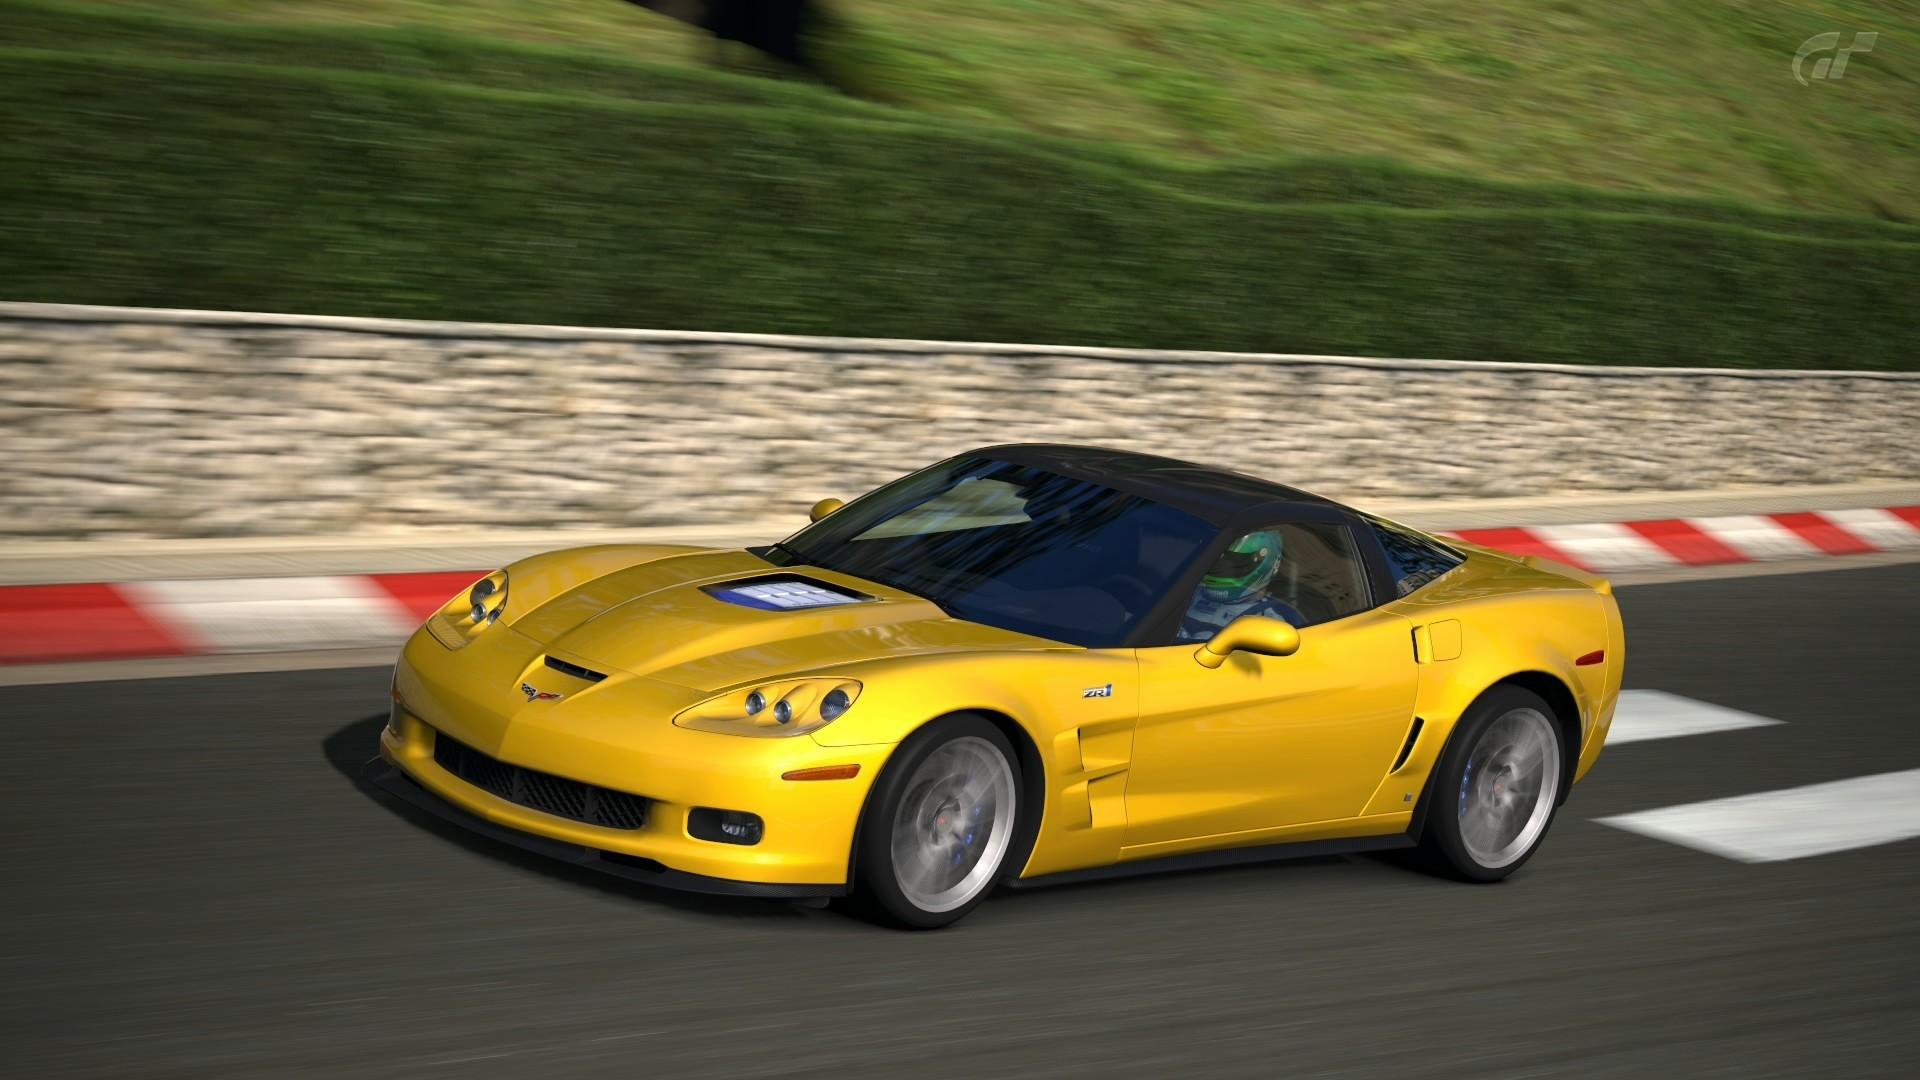 gran turismo 5 chevrolet corvette c6 z06 vs corvette c7. Black Bedroom Furniture Sets. Home Design Ideas